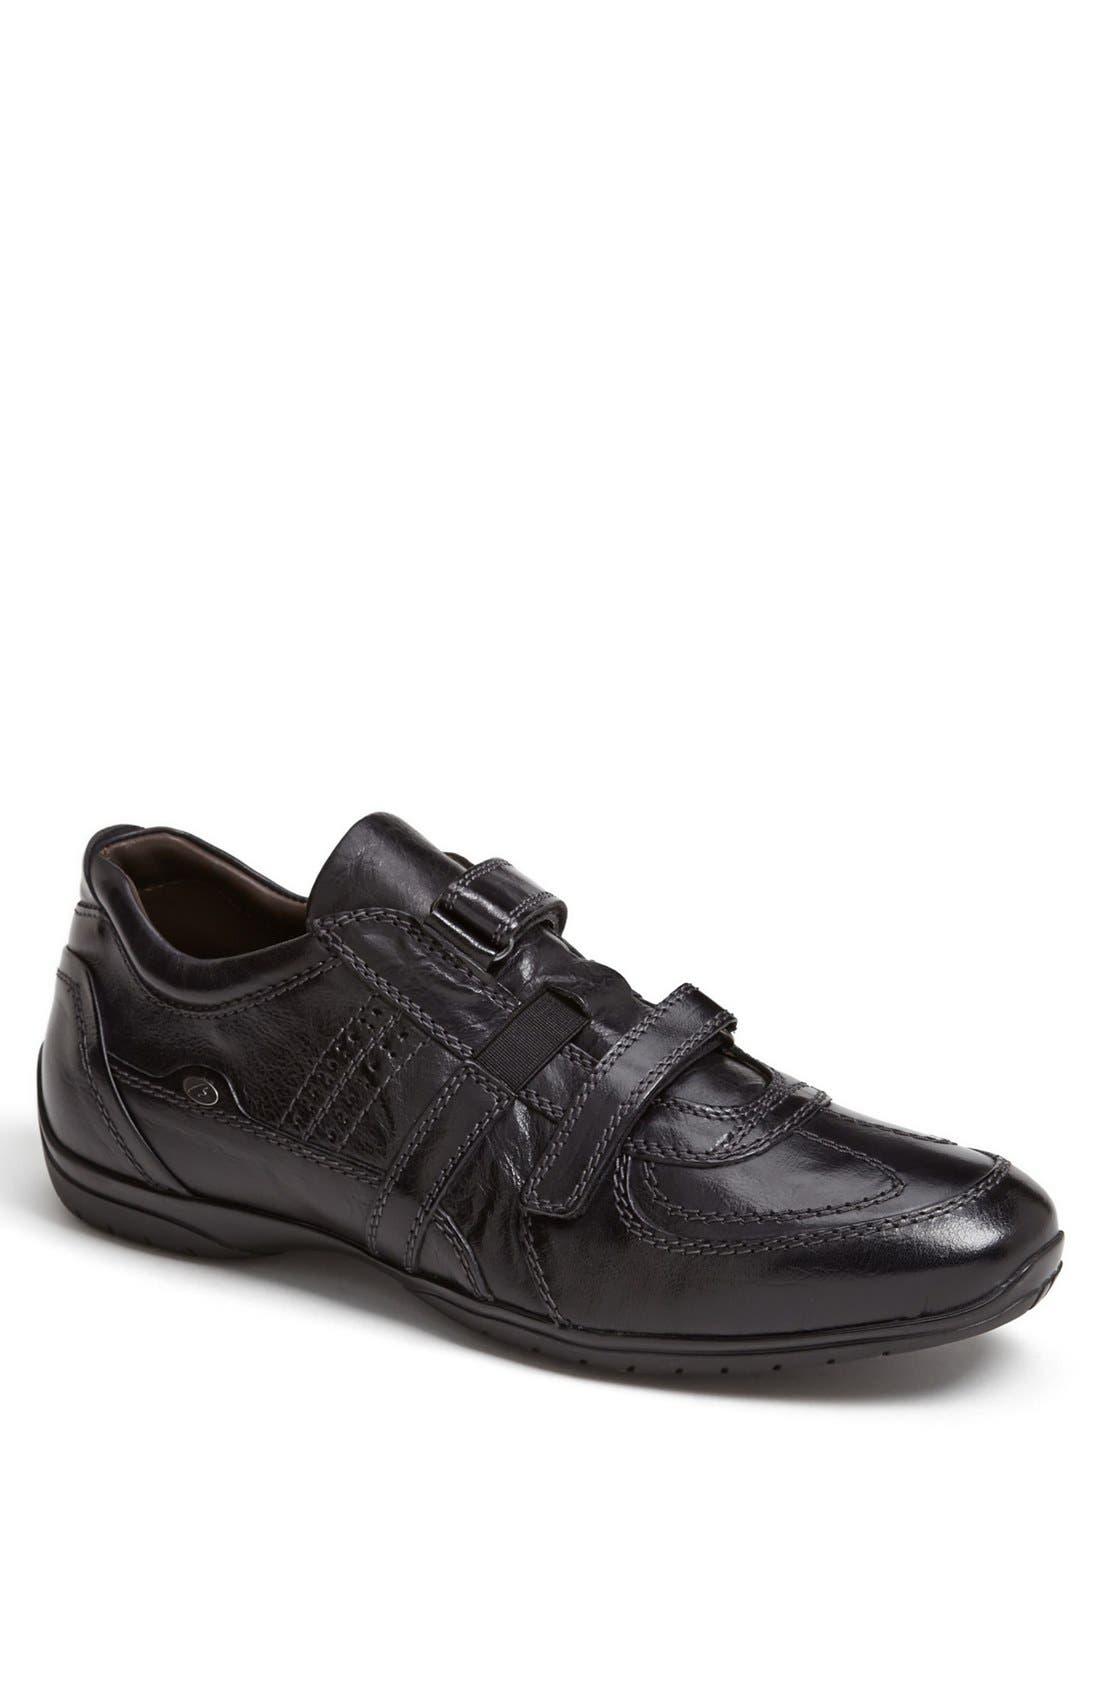 Alternate Image 1 Selected - Bacco Bucci 'Punto' Sneaker